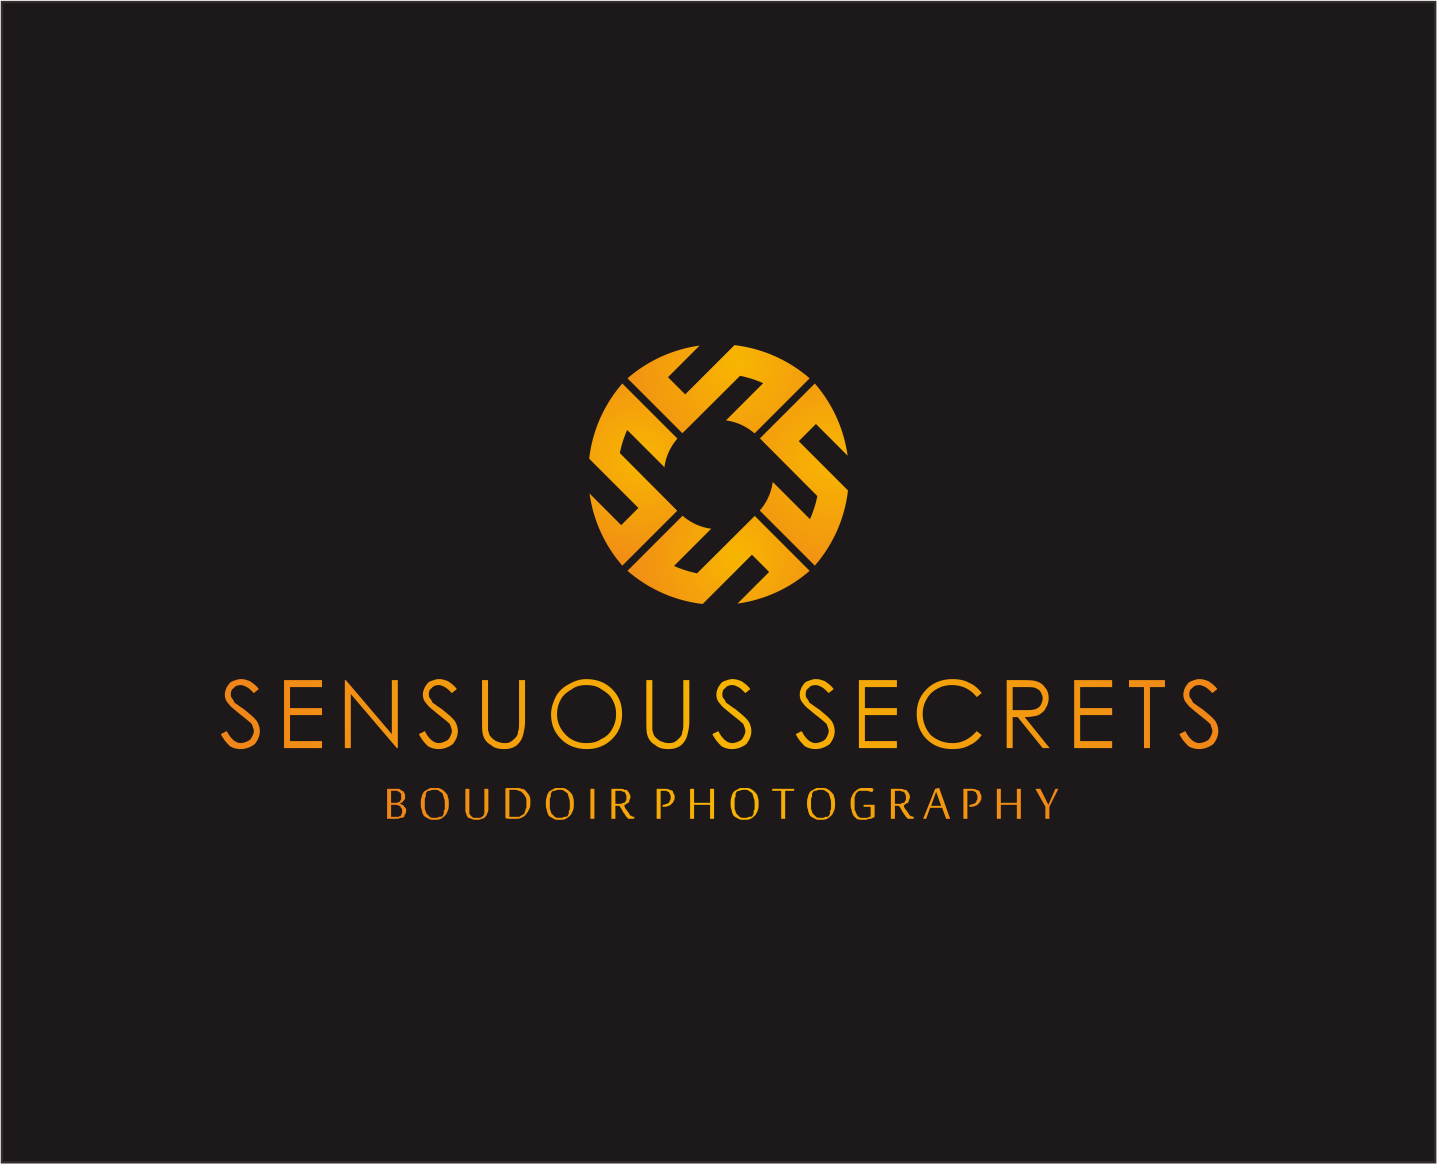 Logo Design by Armada Jamaluddin - Entry No. 113 in the Logo Design Contest Artistic Logo Design for Sensuous Secrets Boudoir Photography.